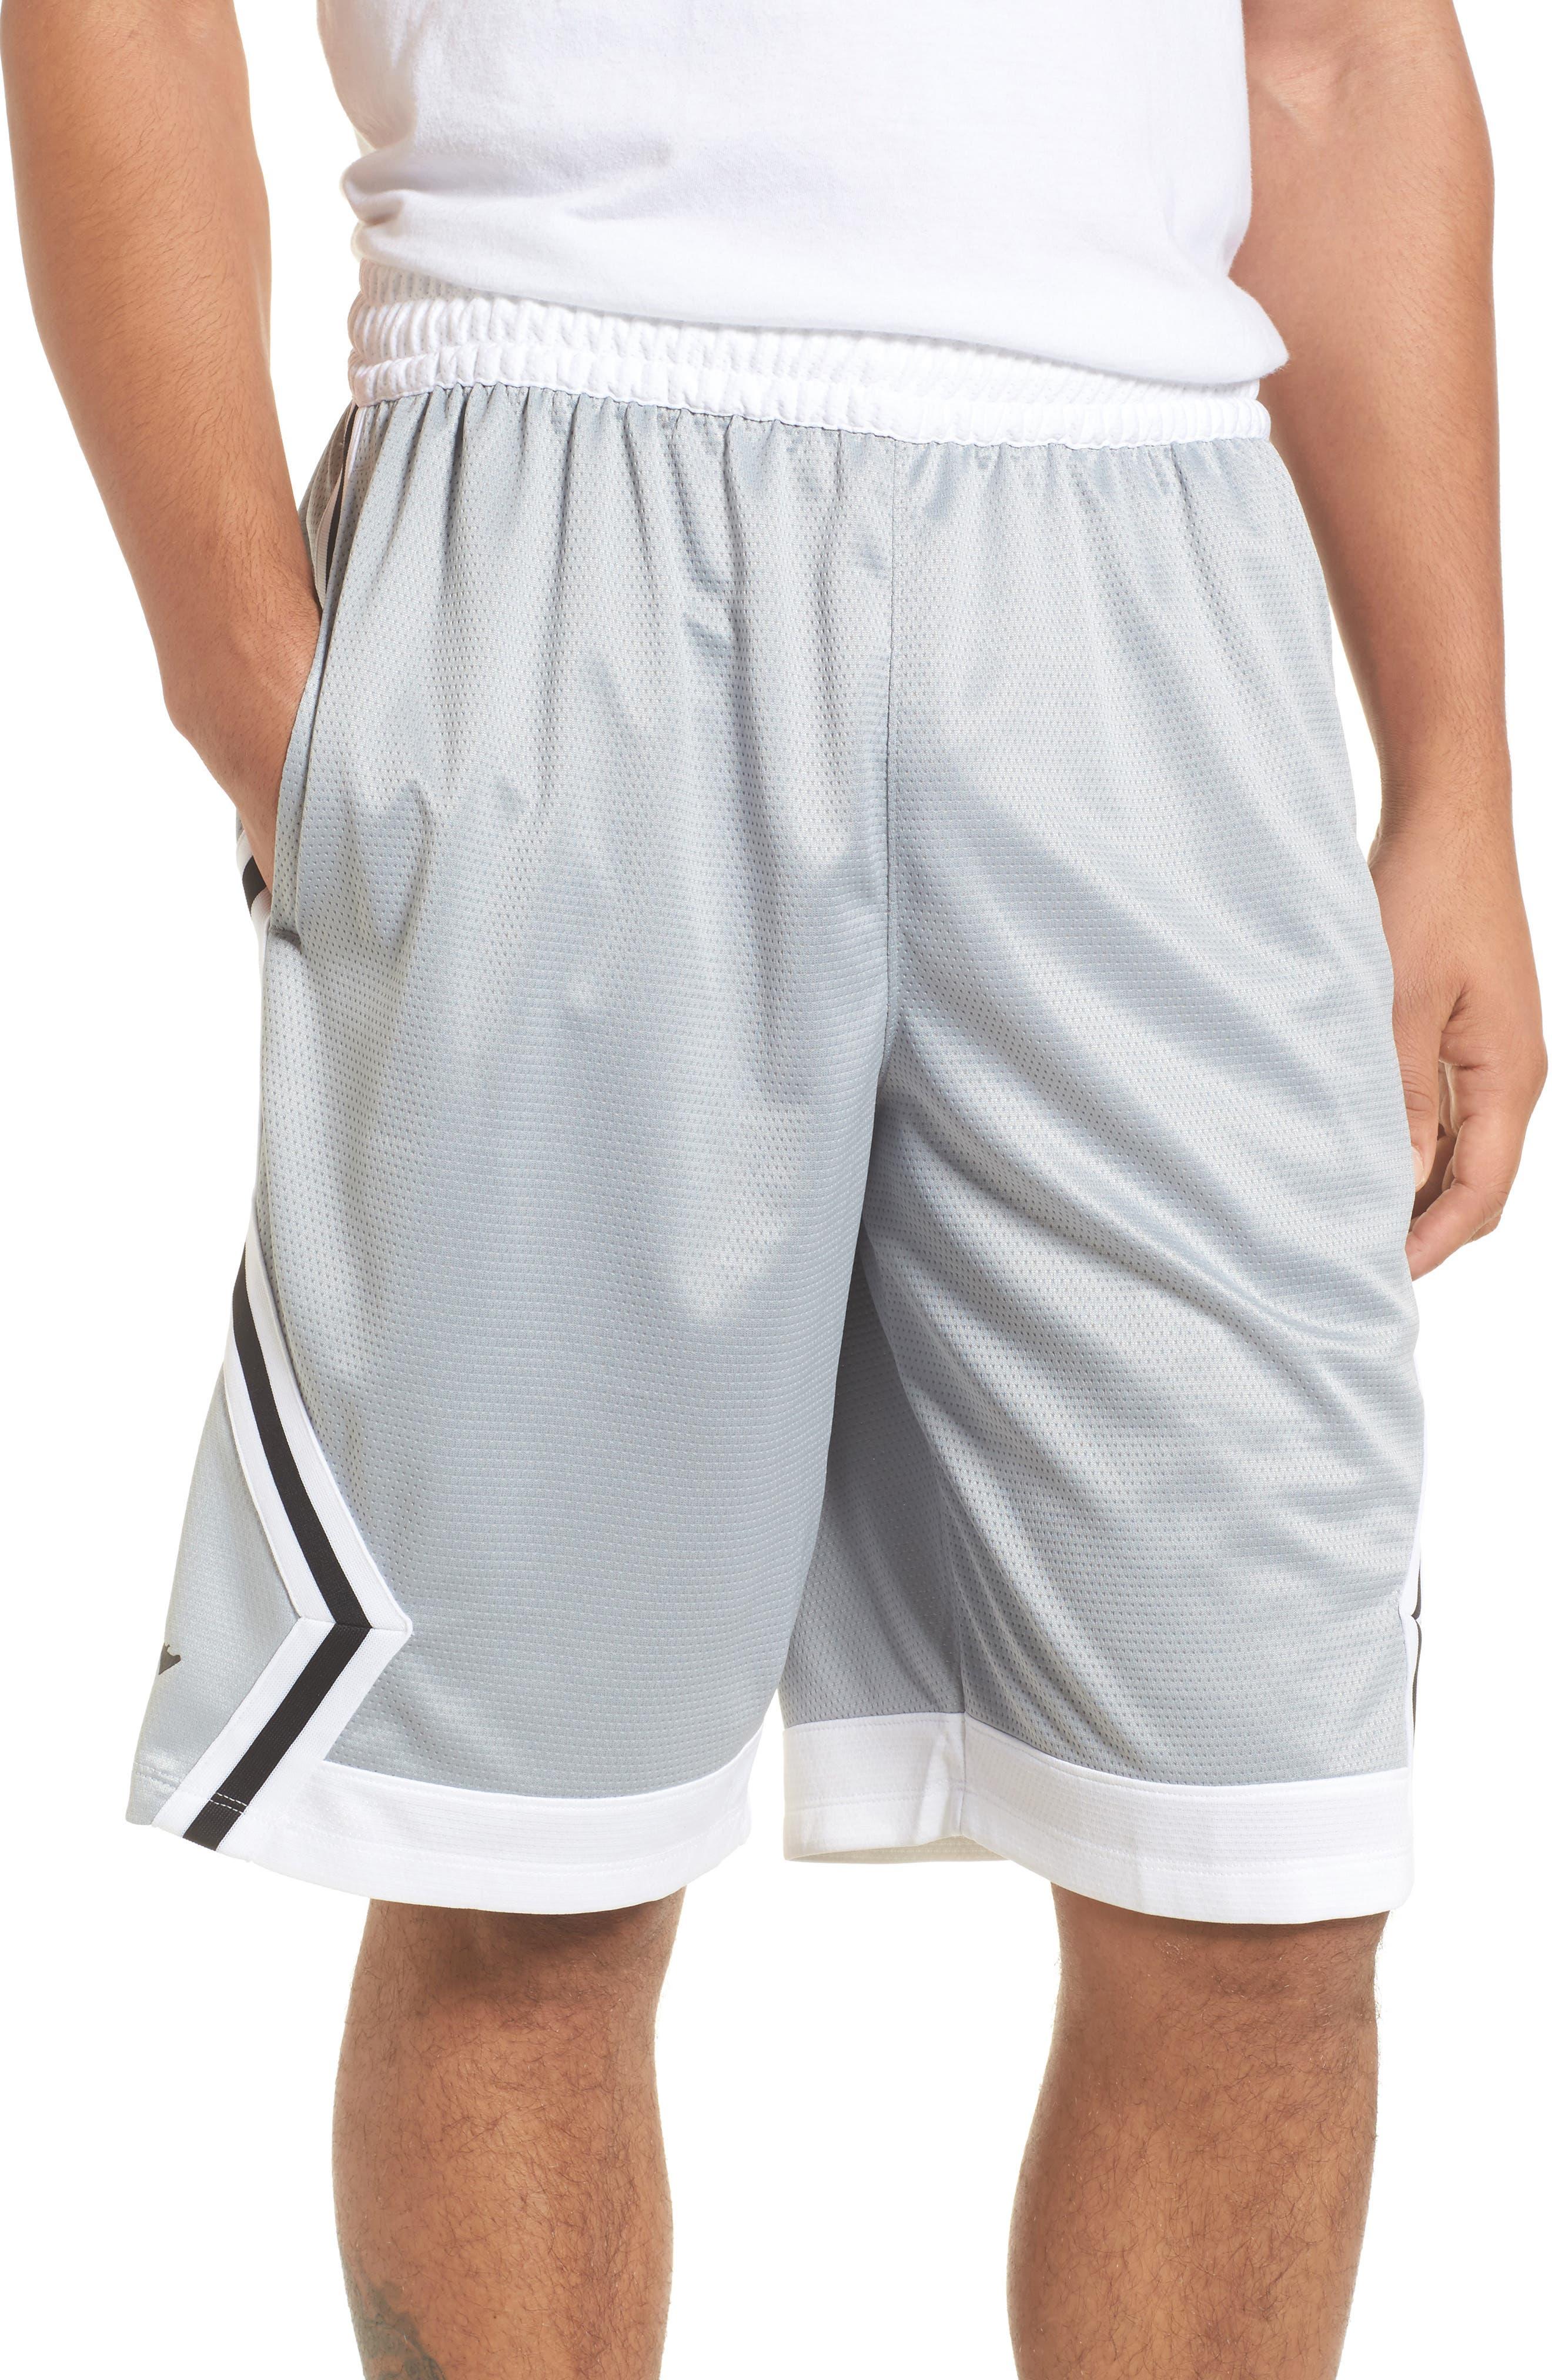 Sportswear Rise Diamond Shorts,                         Main,                         color, 011